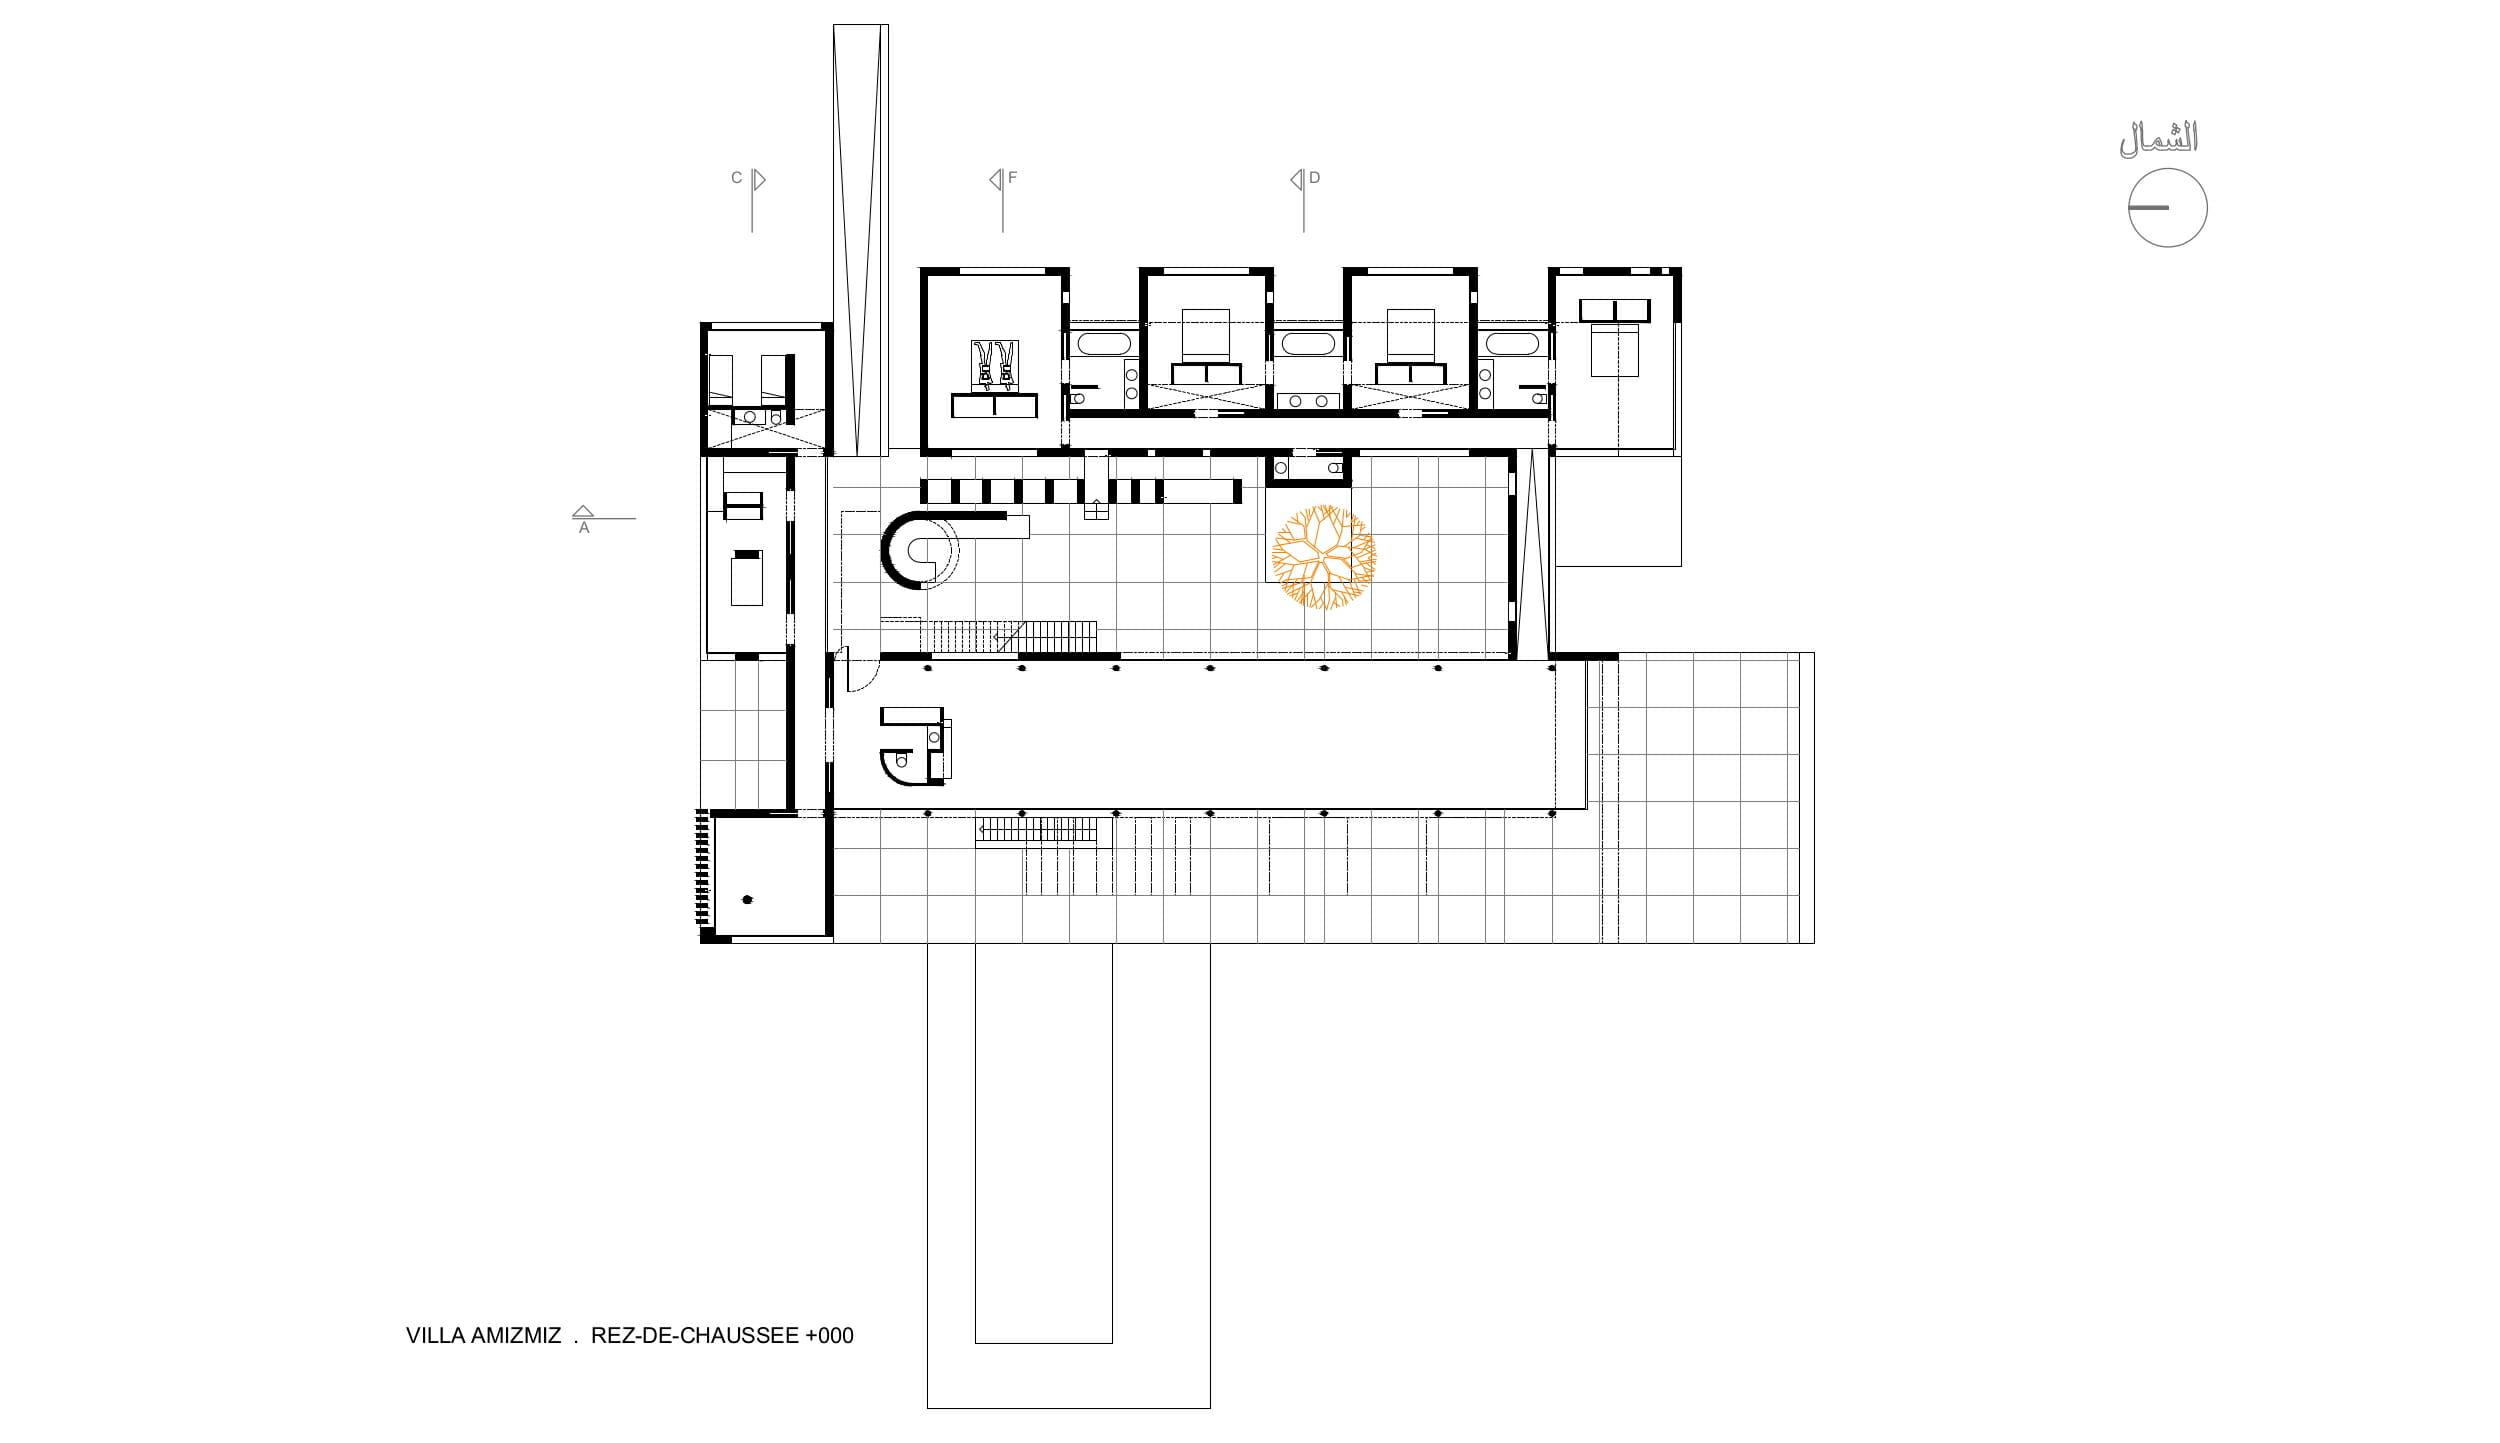 AMIZMIZ.plan-01-rdc